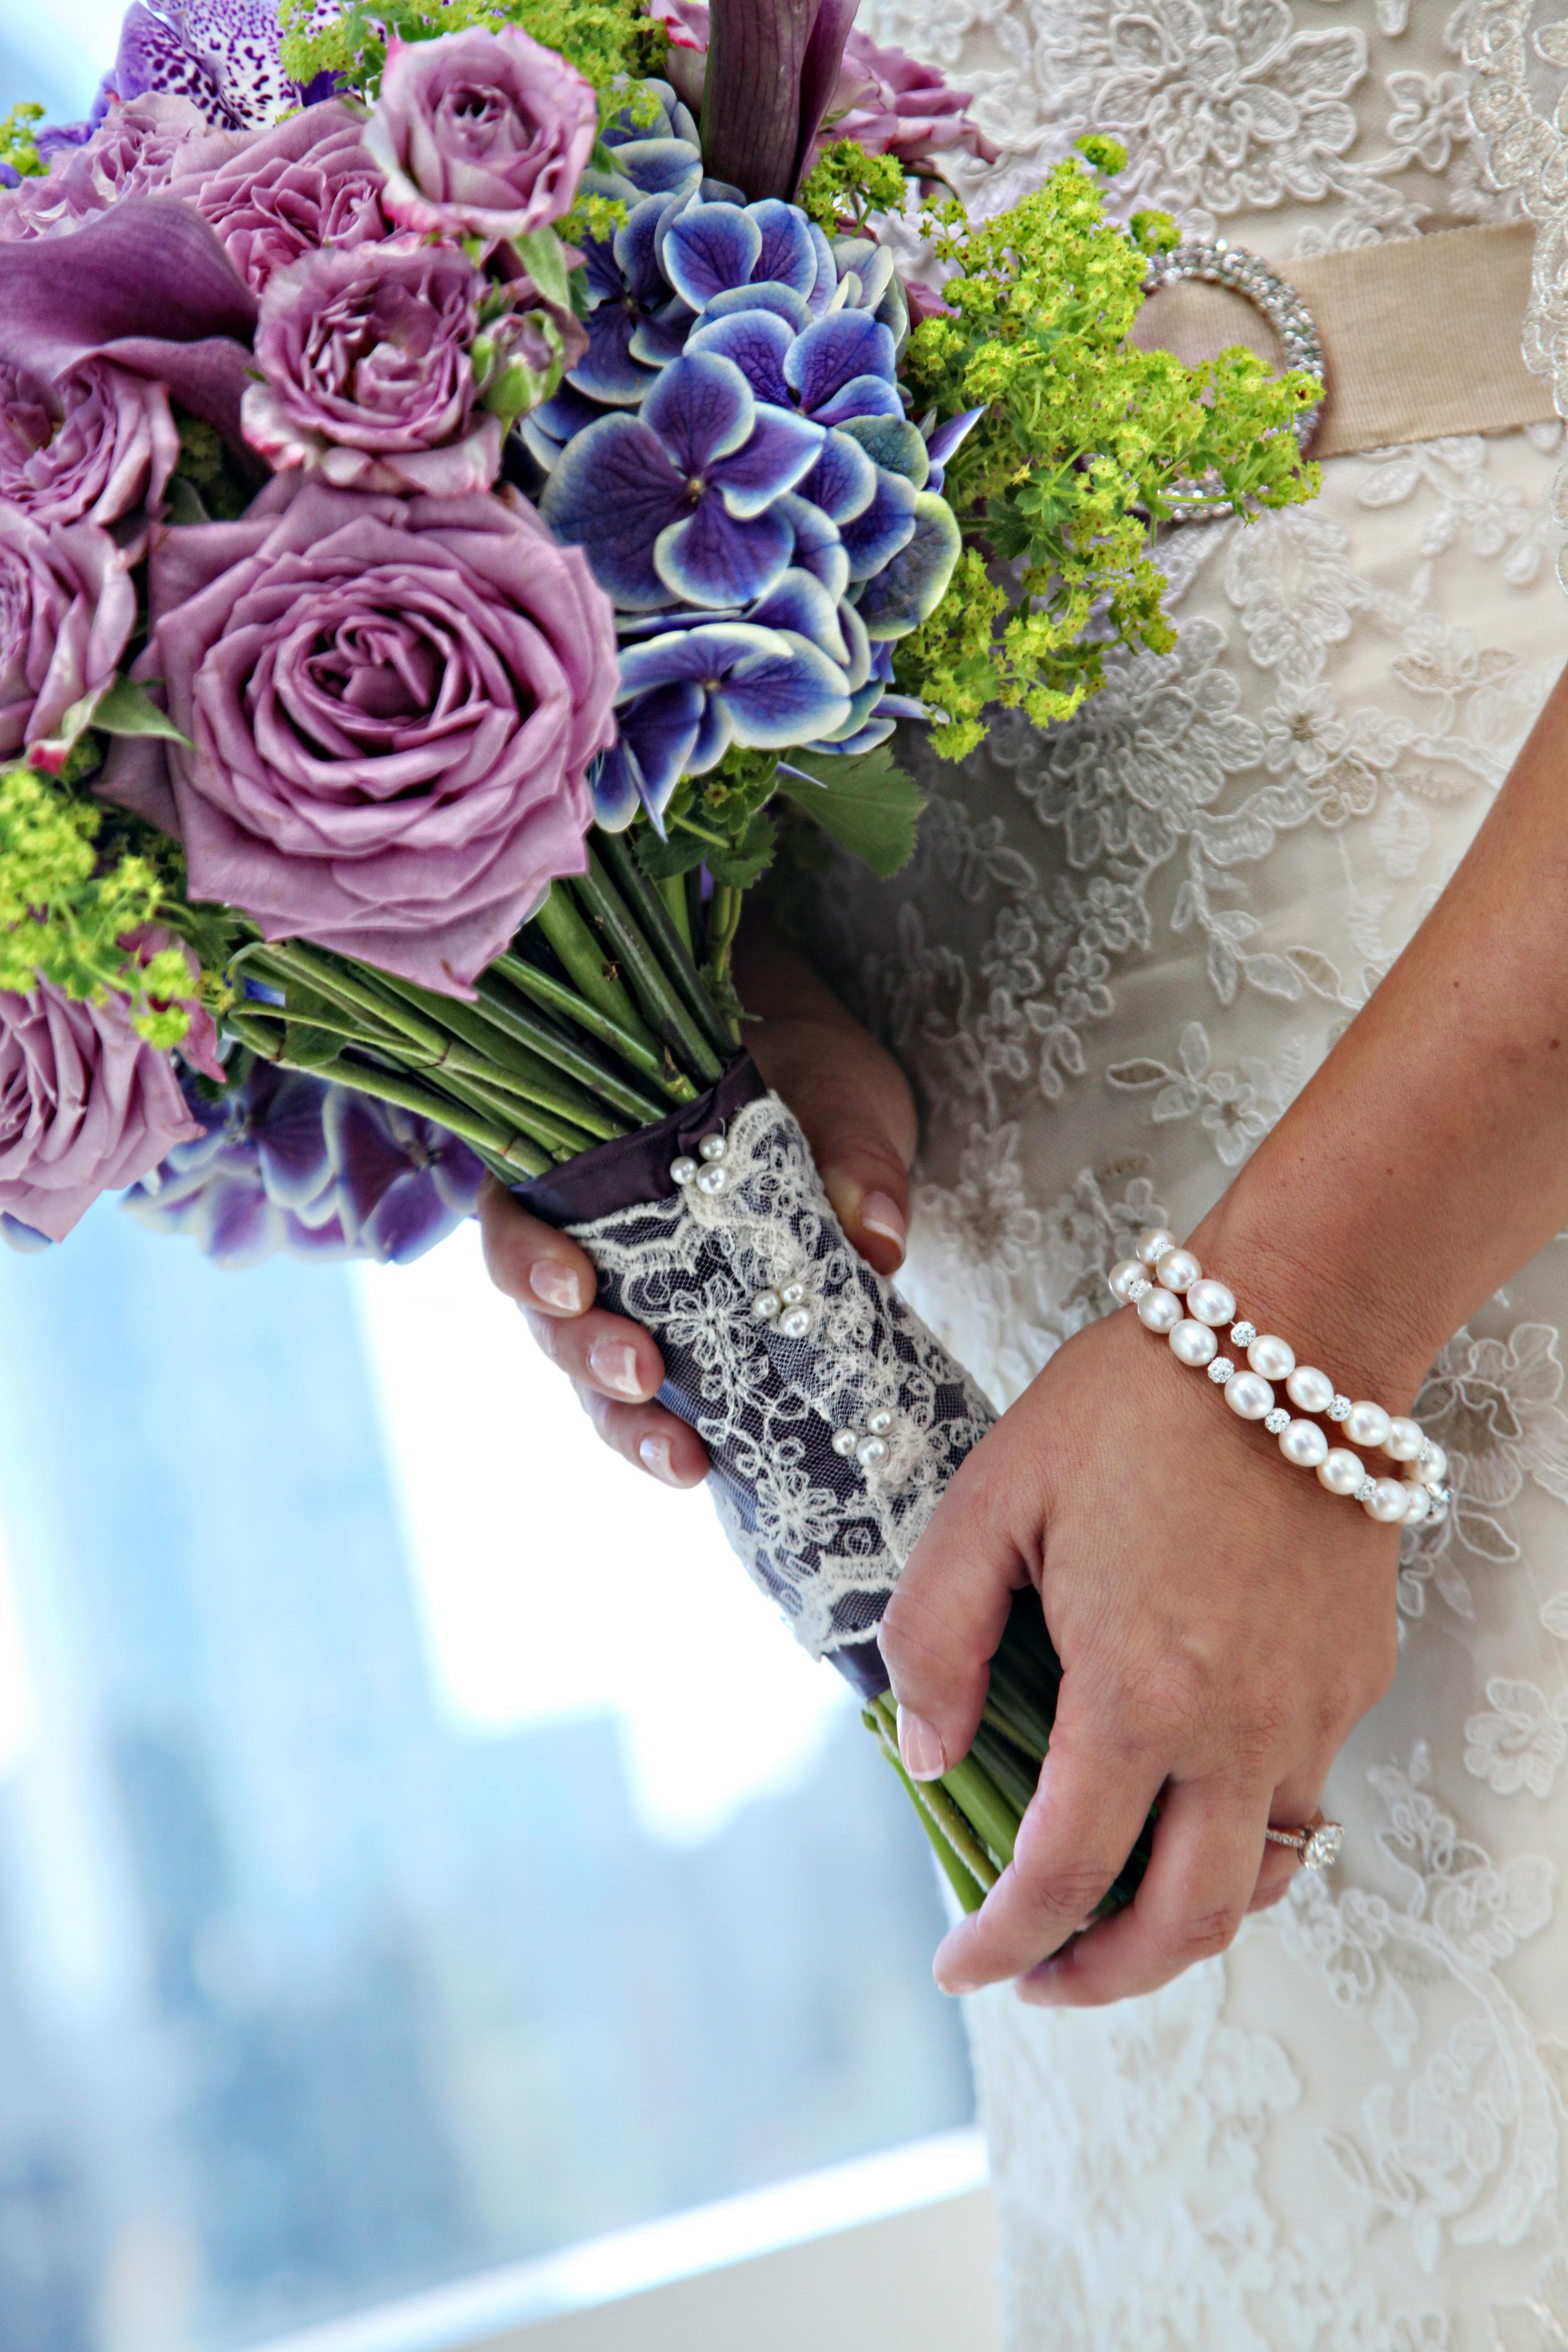 mandarin_oriental_new_york_city_branding_inspiration_lavender_silver_wedding_floral_purple_v284_9.jpg